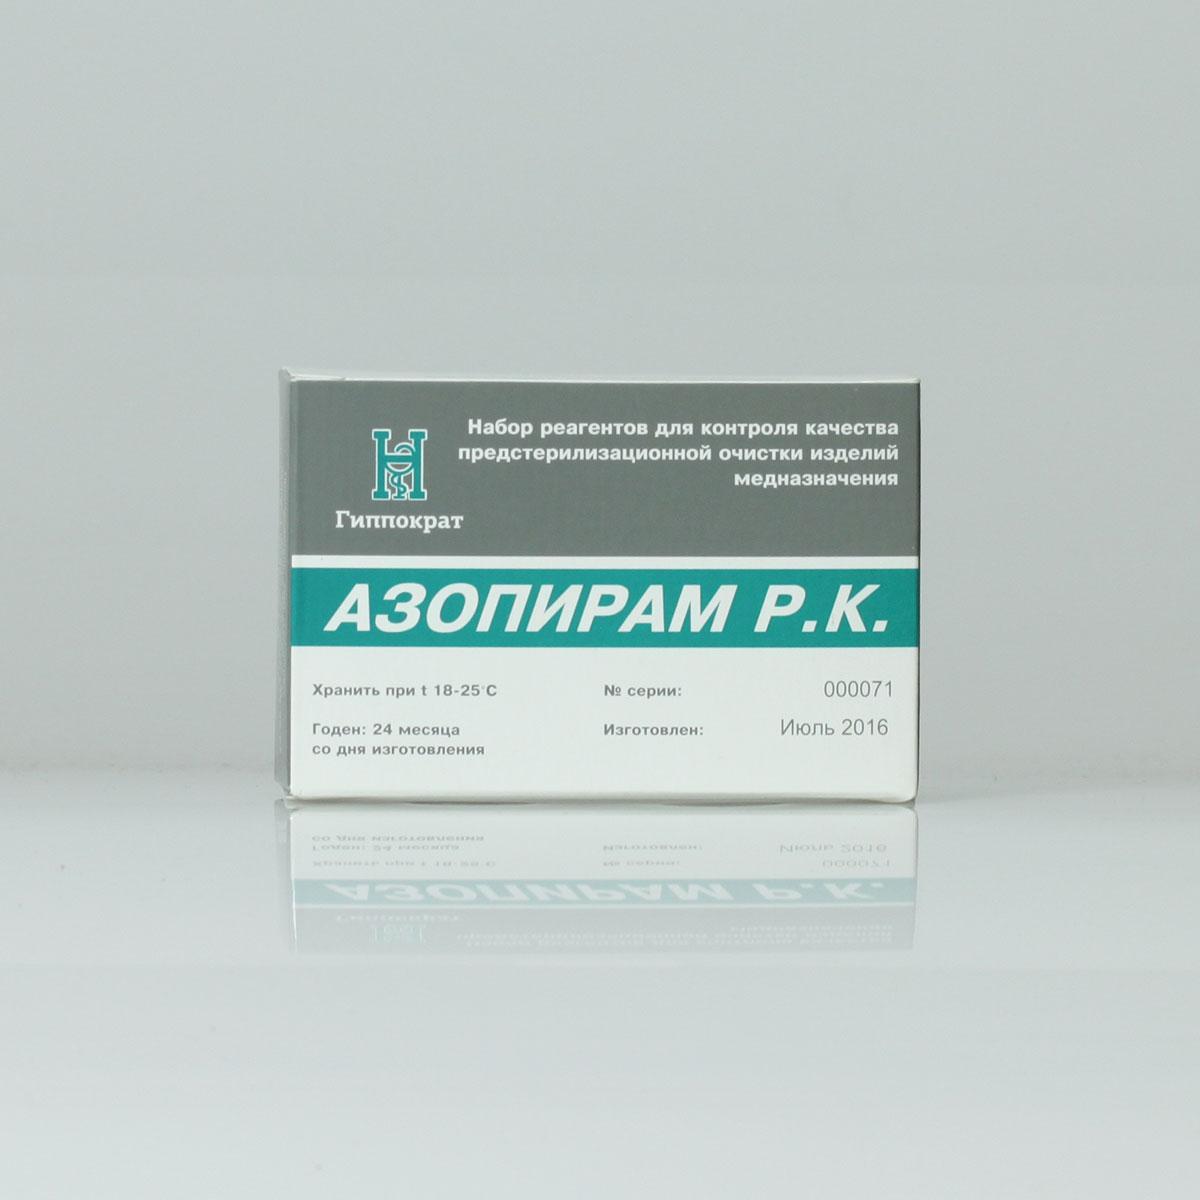 АЗОПИРАМ®-РК набор реагентов, 1000 определений.